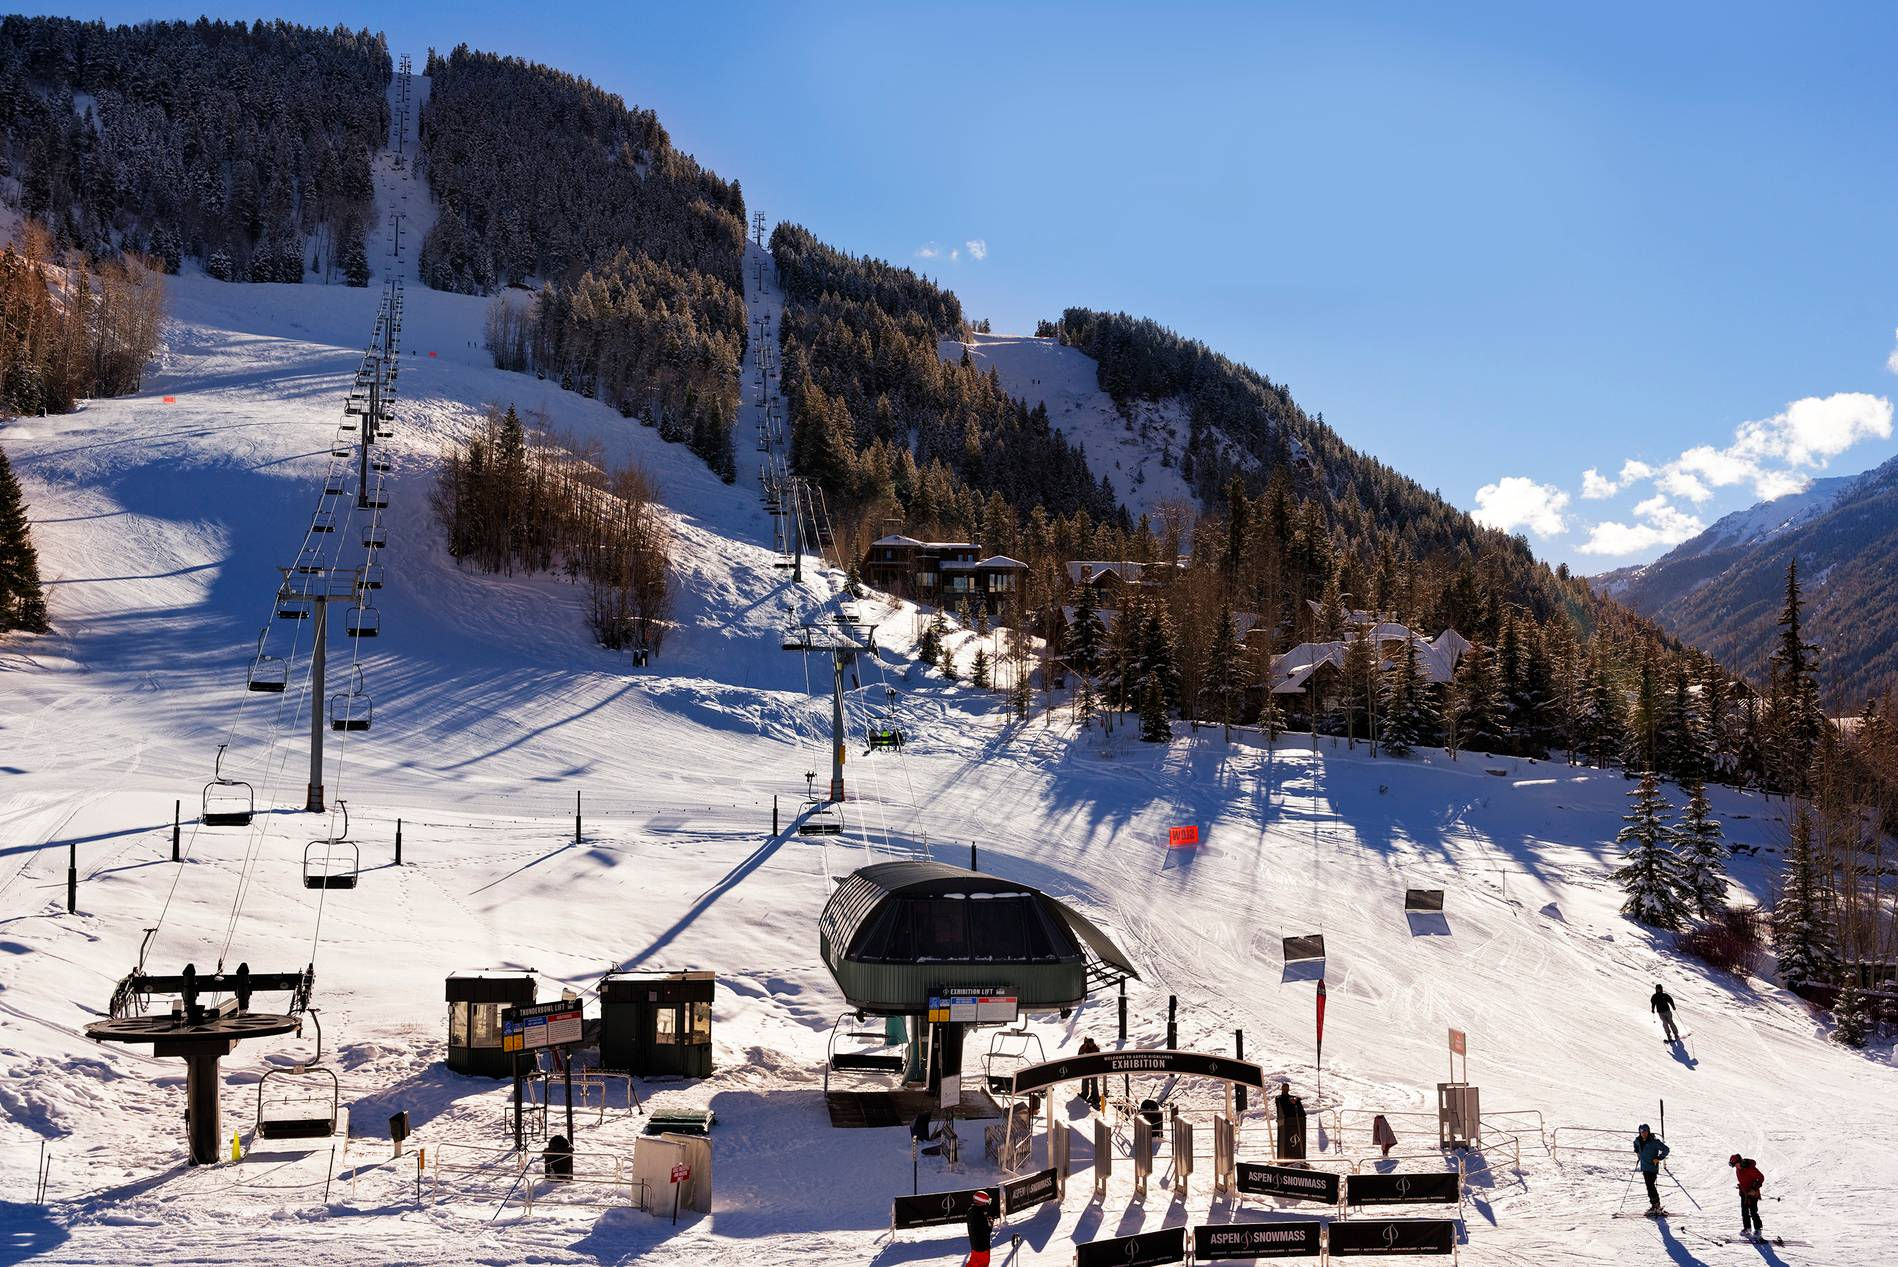 0133 Prospector Road Unit 4301 Winter Interest #2 Aspen Photo 17